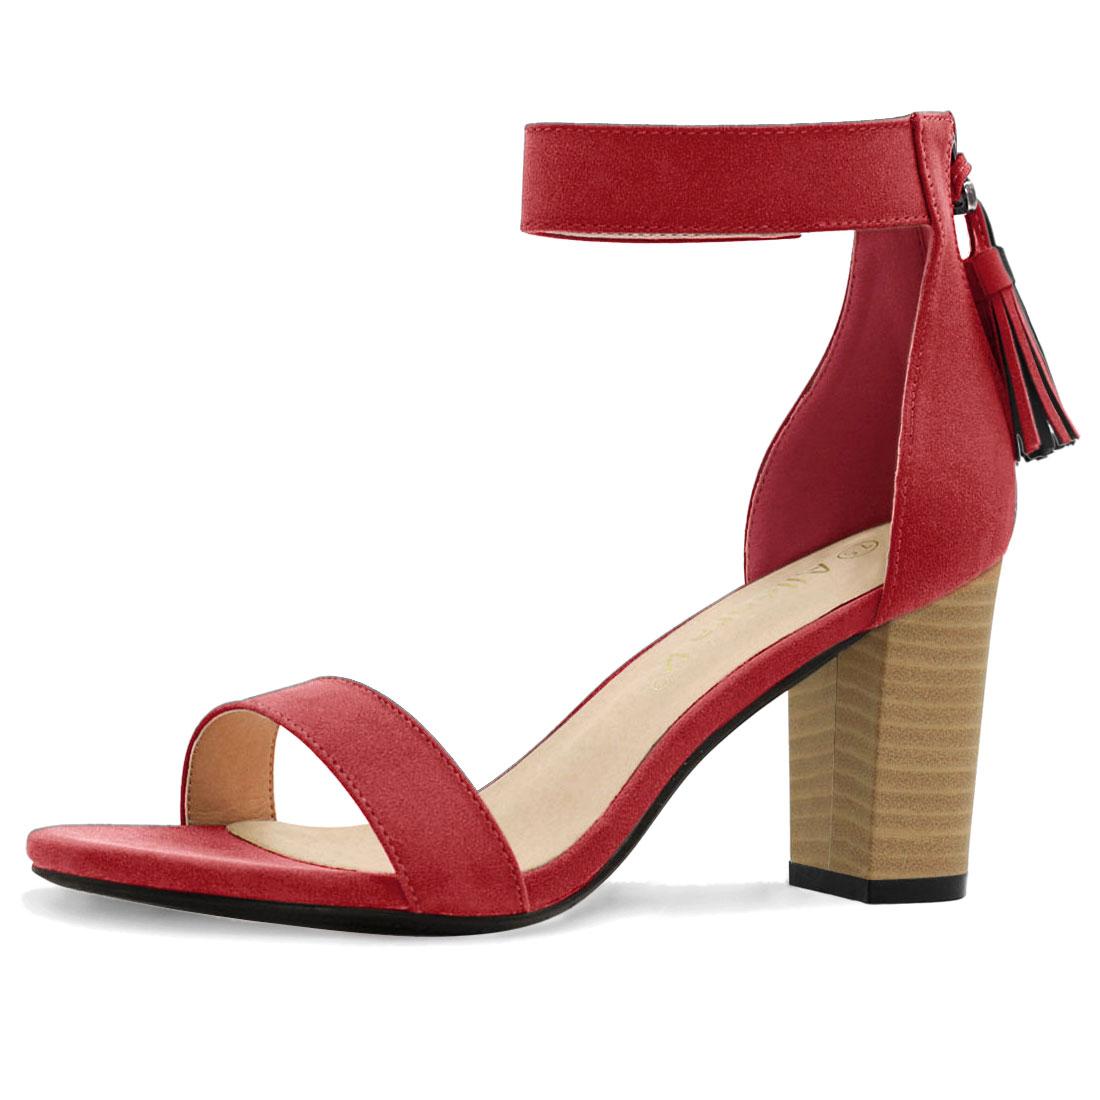 Women Open Toe Tassel Stacked Heel Ankle Strap Sandals Red US 4.5